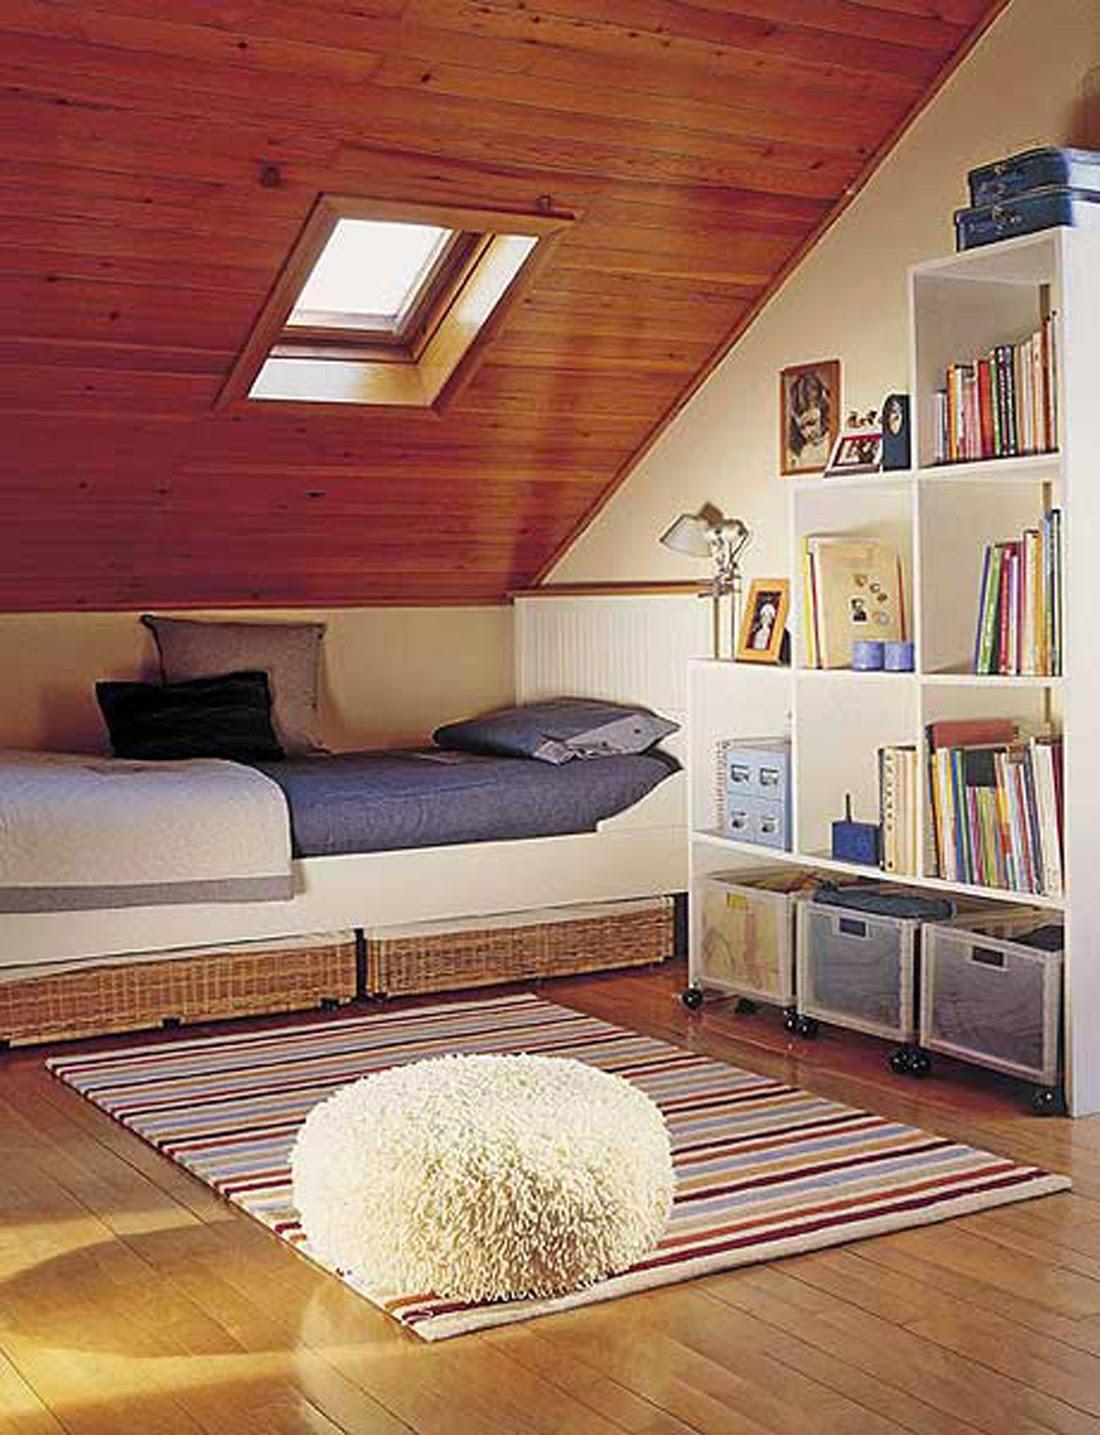 Rooms In Roof Designs: Cute Pinterest: Attic Bedrooms